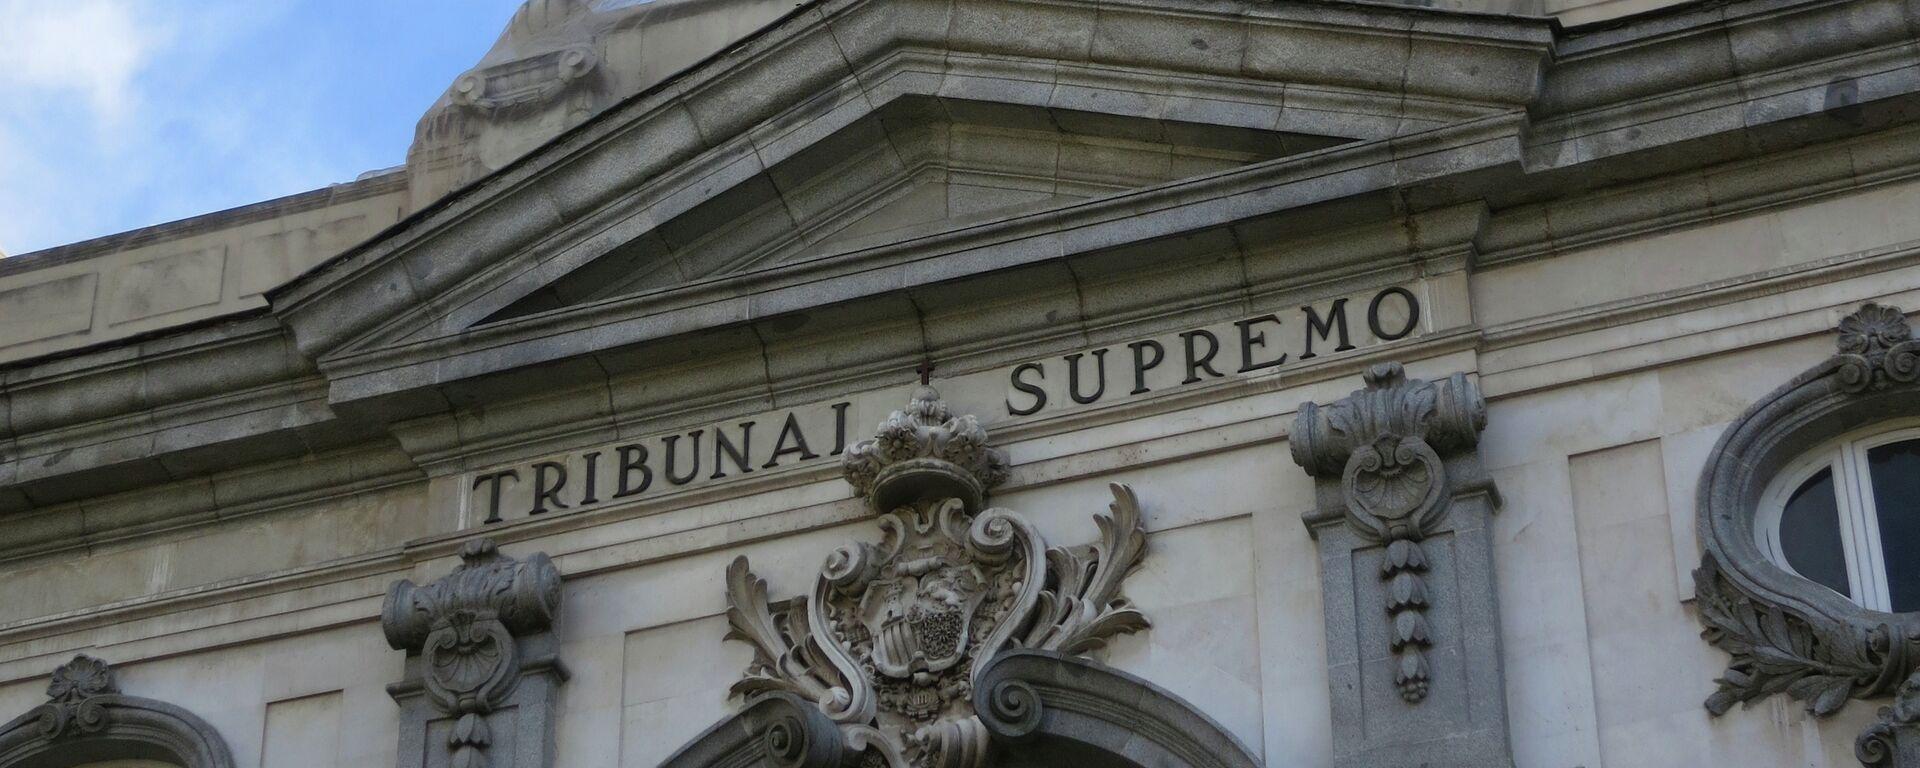 Tribunal Supremo de España - Sputnik Mundo, 1920, 24.09.2021